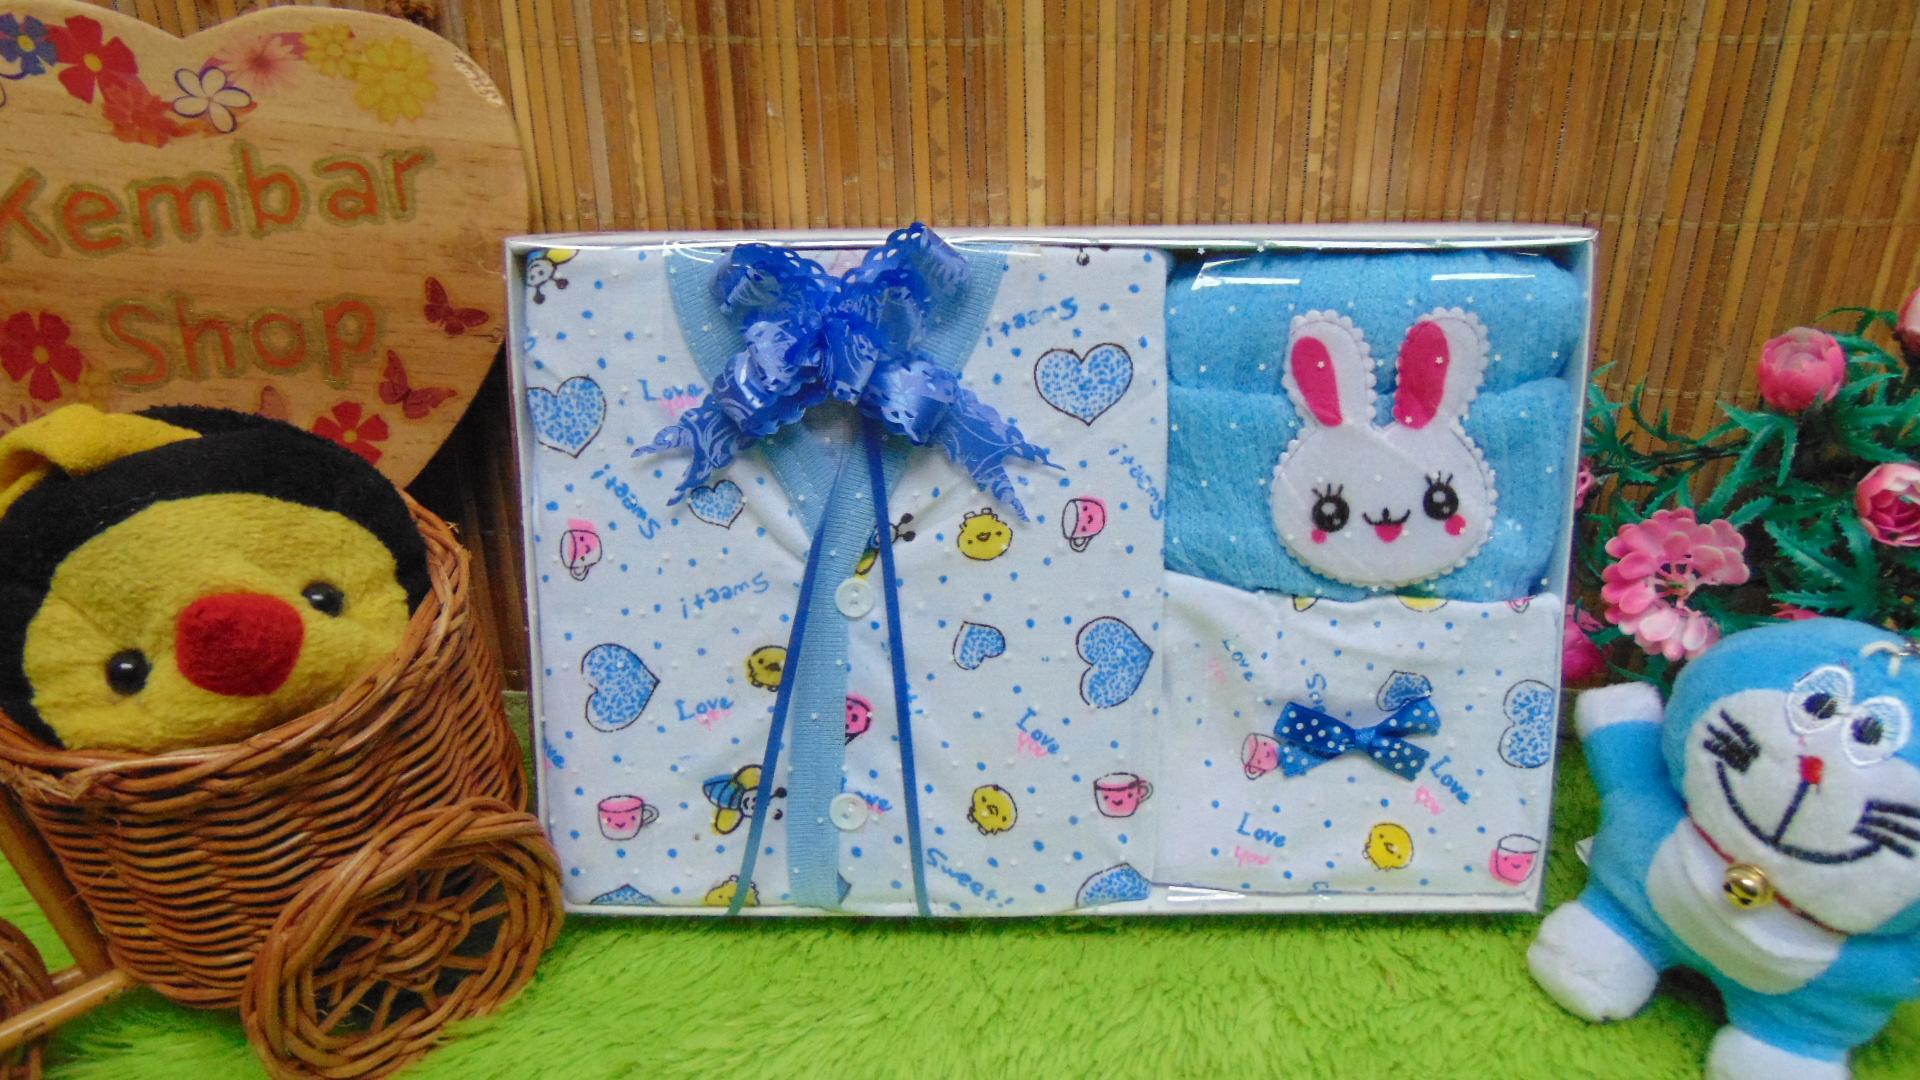 FREE KARTU UCAPAN Kado Lahiran Paket Kado Bayi Newborn Baby Gift Box Lebah Rajut Full Package Aneka Warna (4)